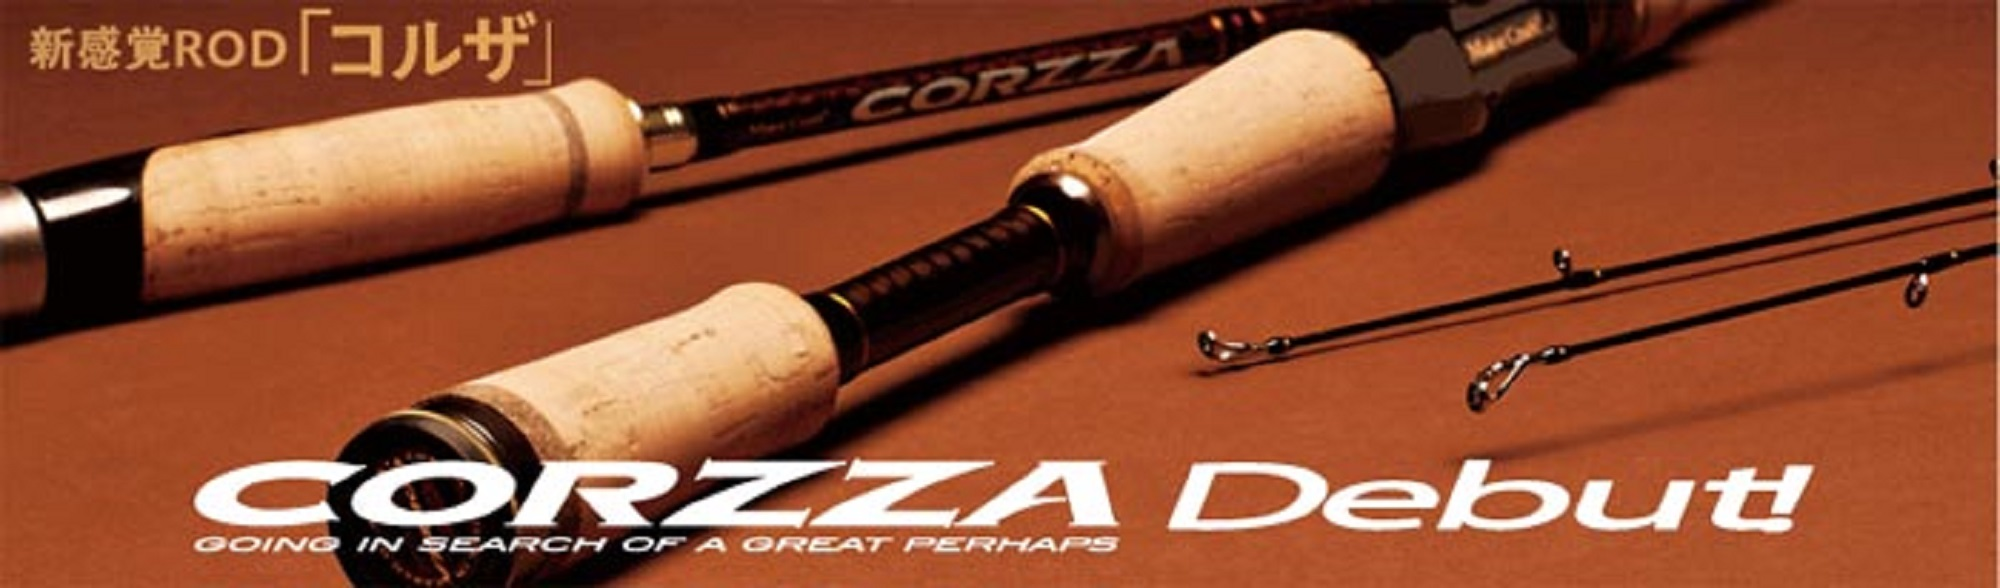 Sale Major Craft Corzza Series Spinning Rod CZS 64UL